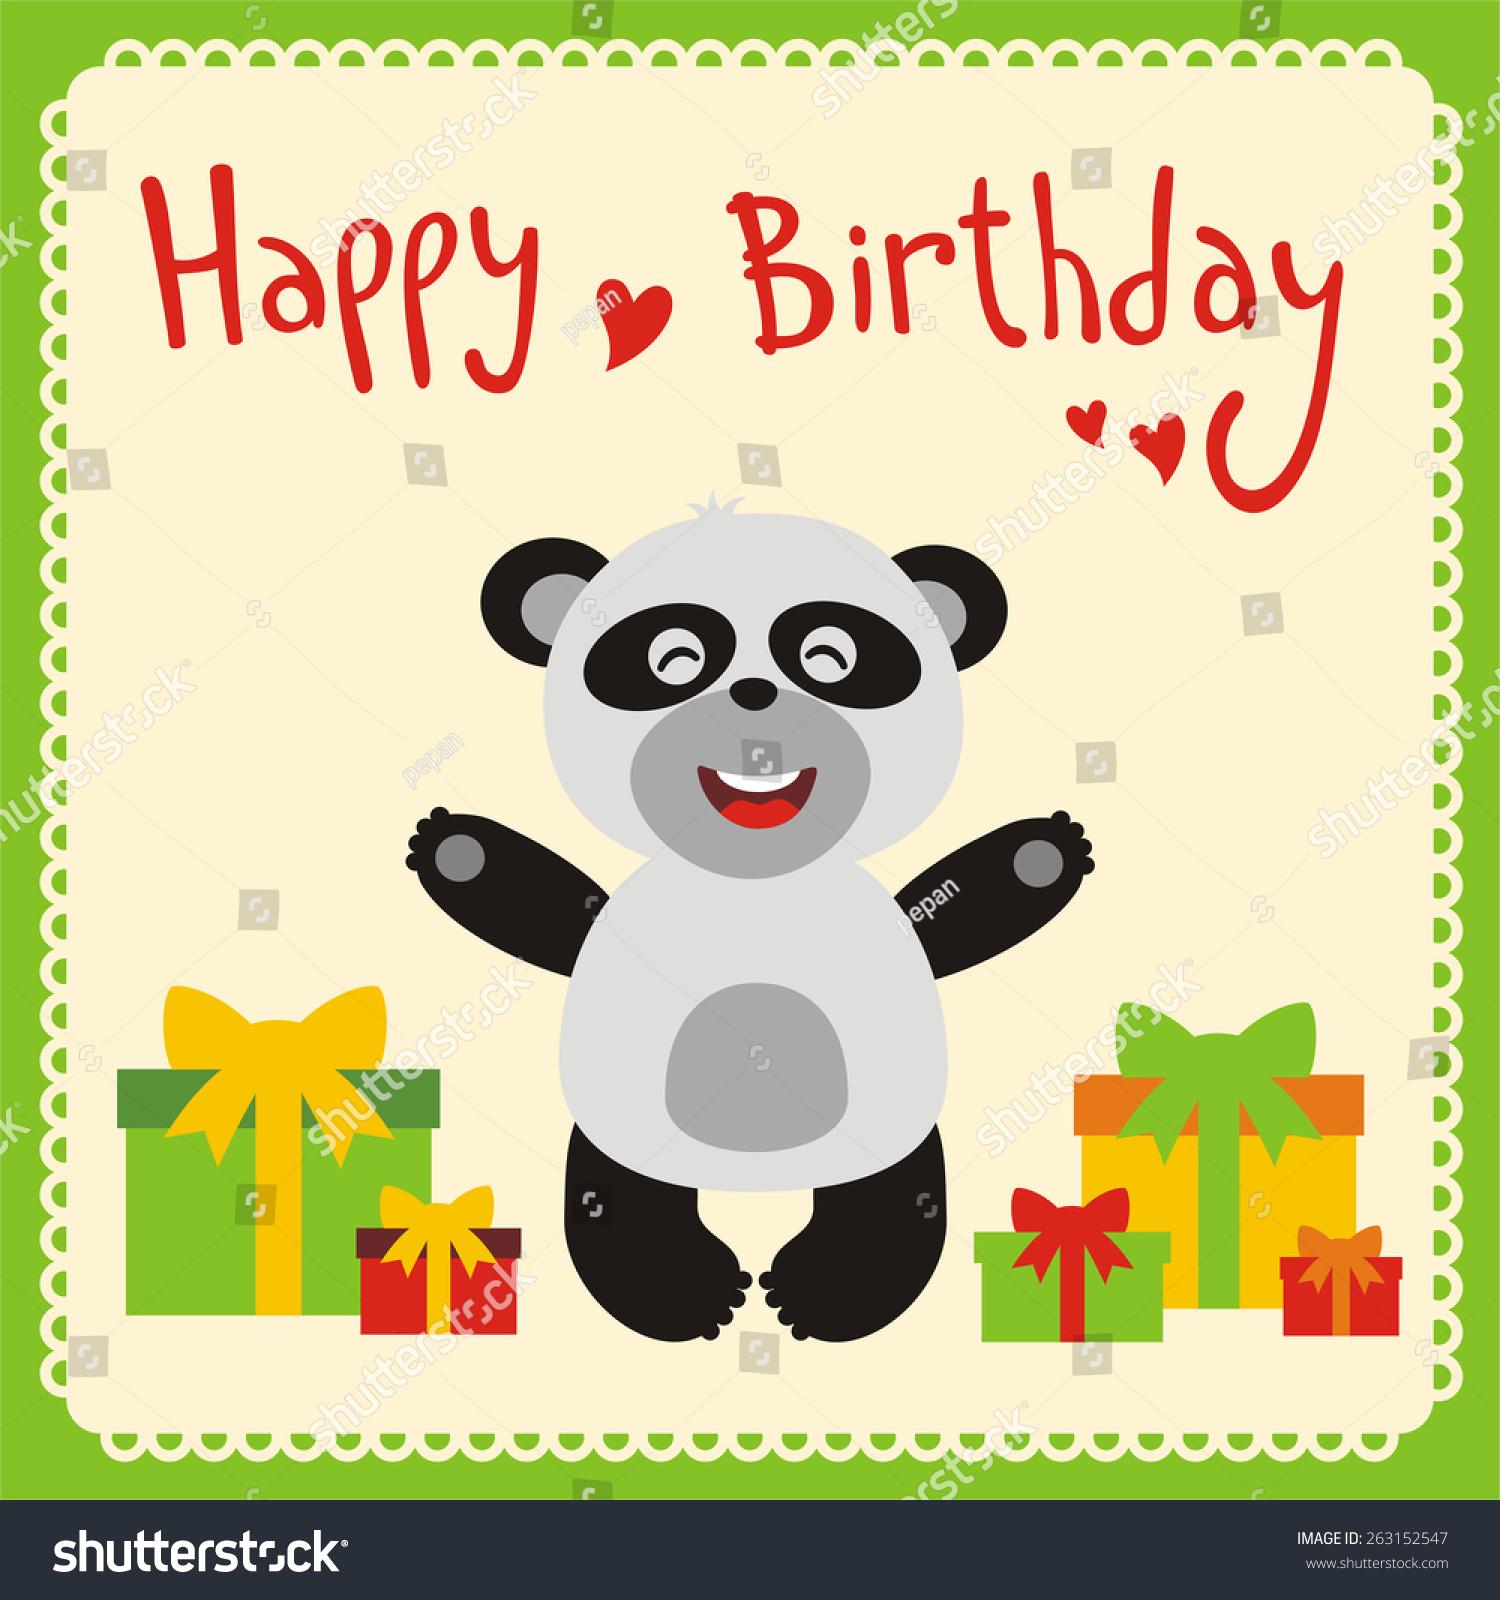 Happy birthday card smiling panda birthday stock vector 263152547 happy birthday card smiling panda with birthday gifts bookmarktalkfo Choice Image